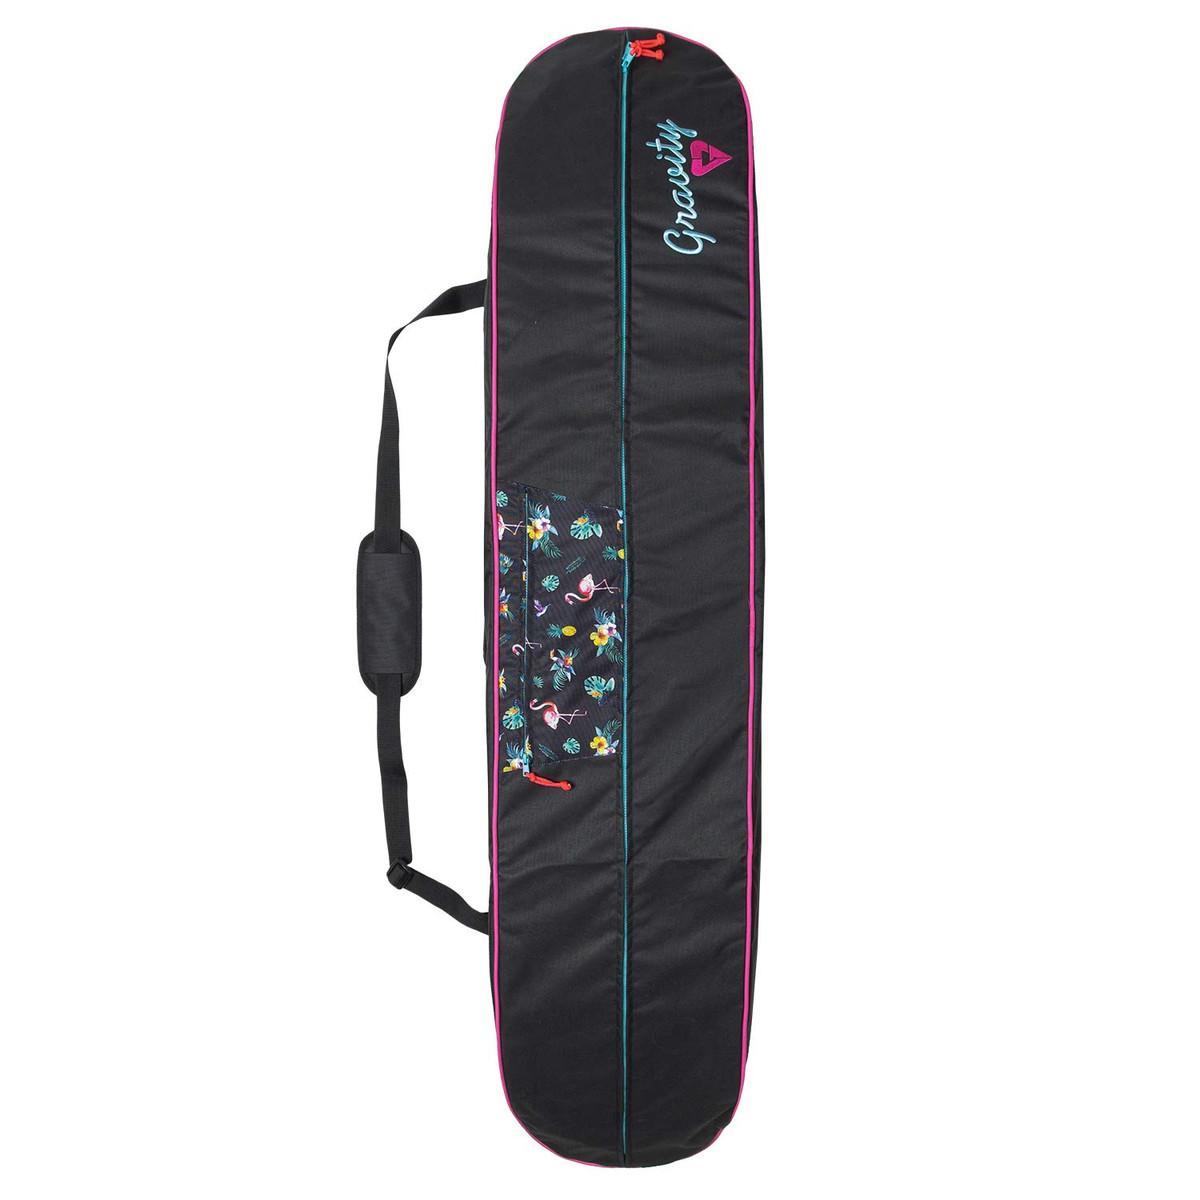 Obal na snowboard Gravity Rainbow 17/18 150 cm